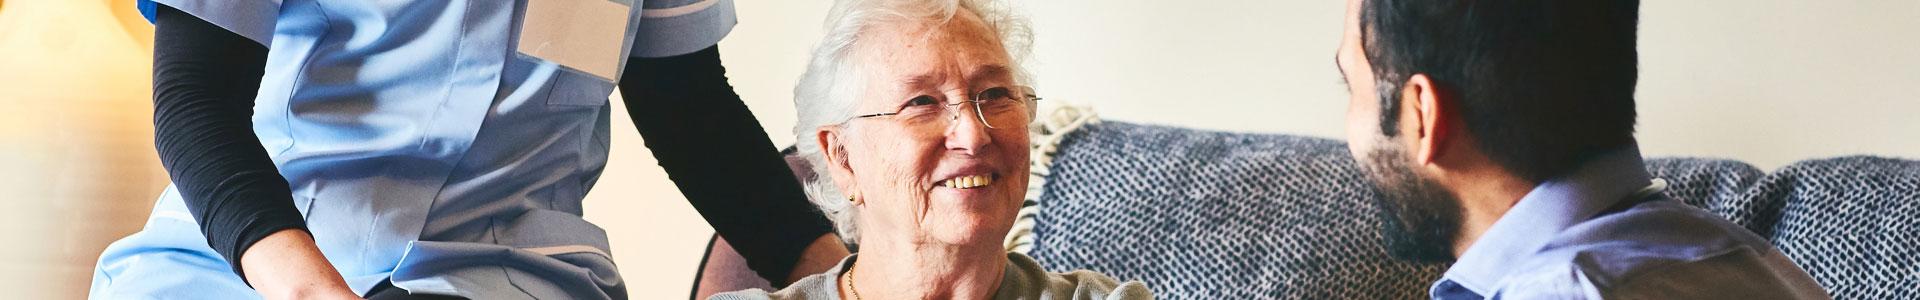 Skilled Nursing Hero Banner, Vinson Hall Retirement Community, McLean